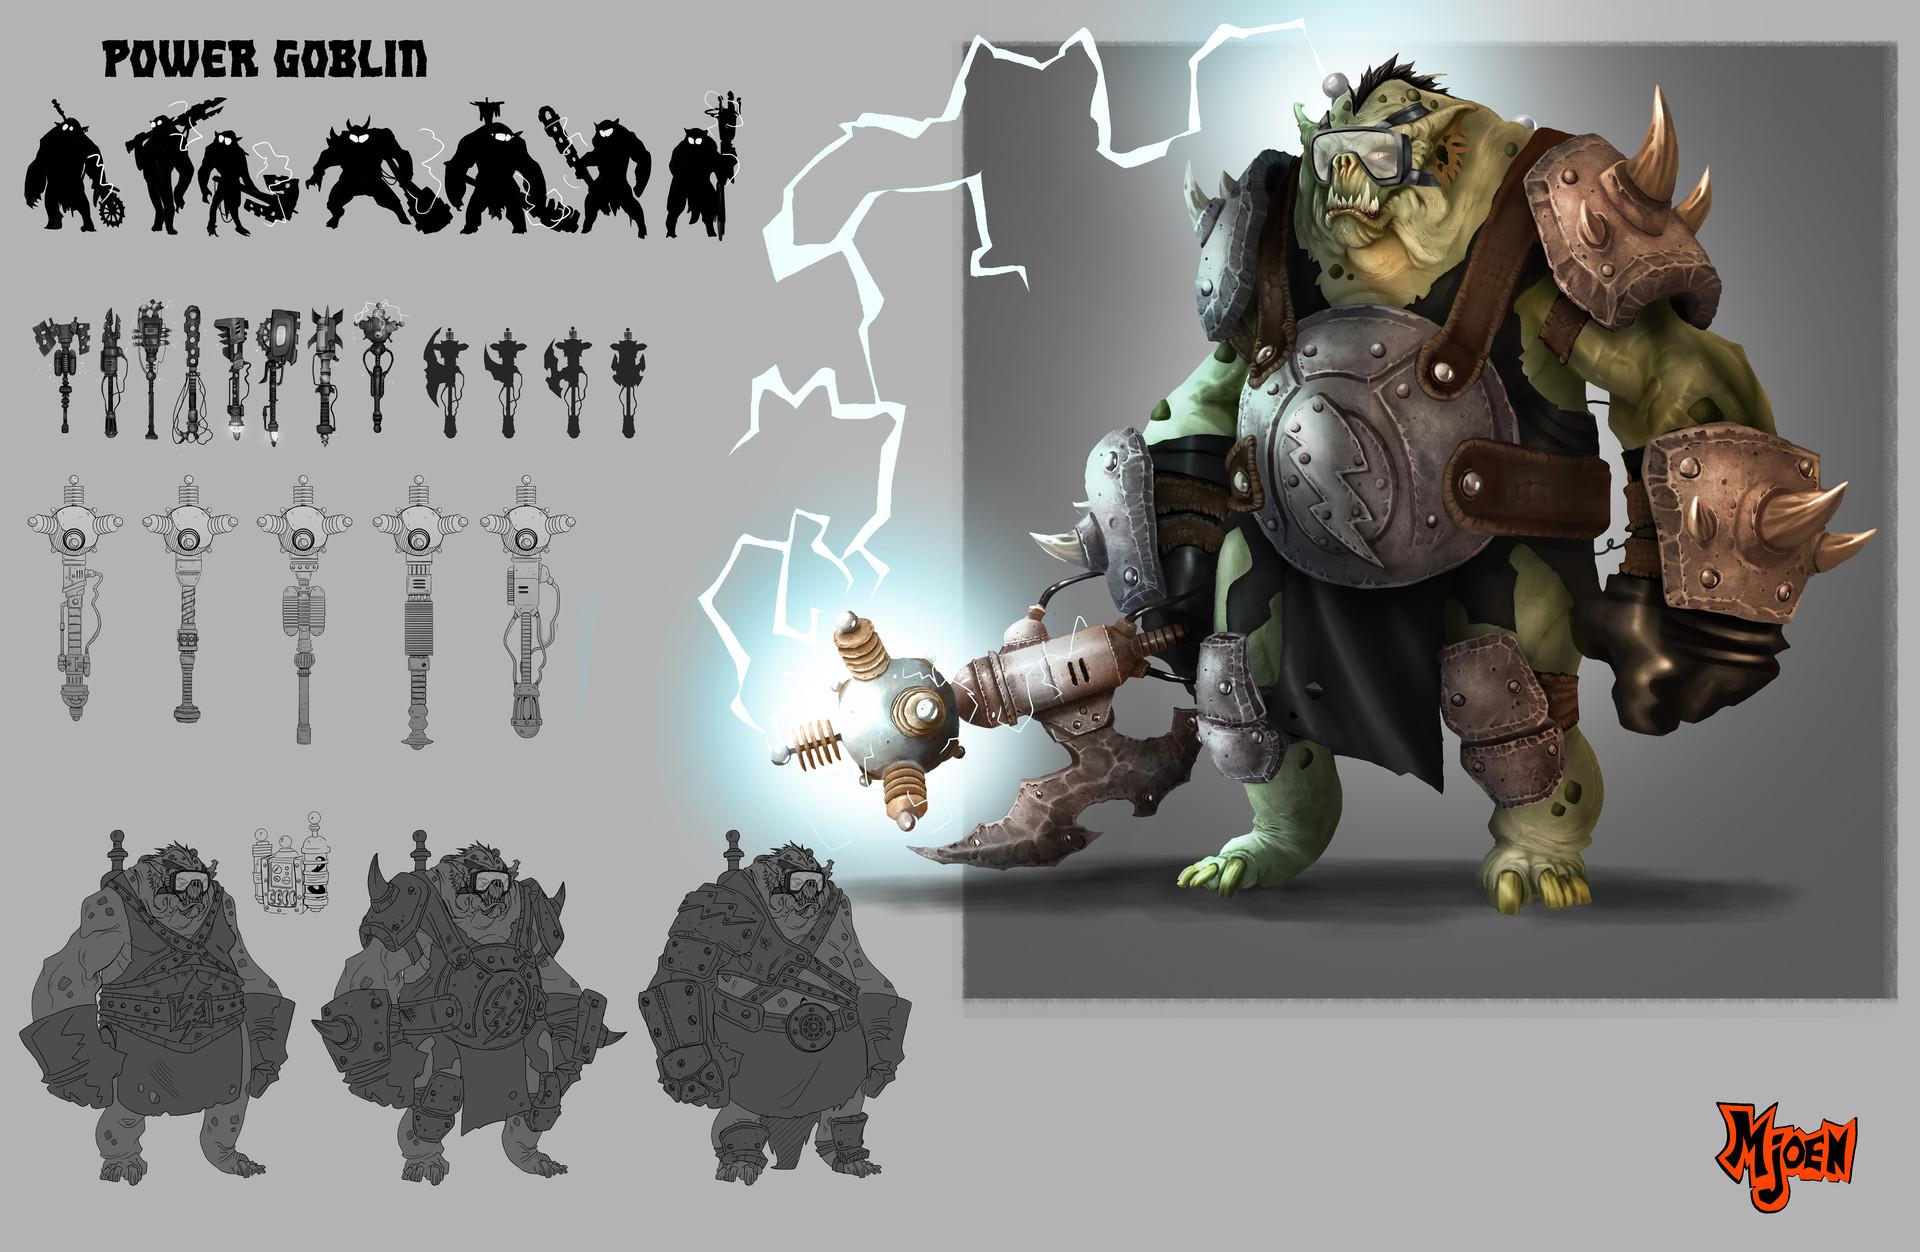 Kyle mjoen power goblin sheet